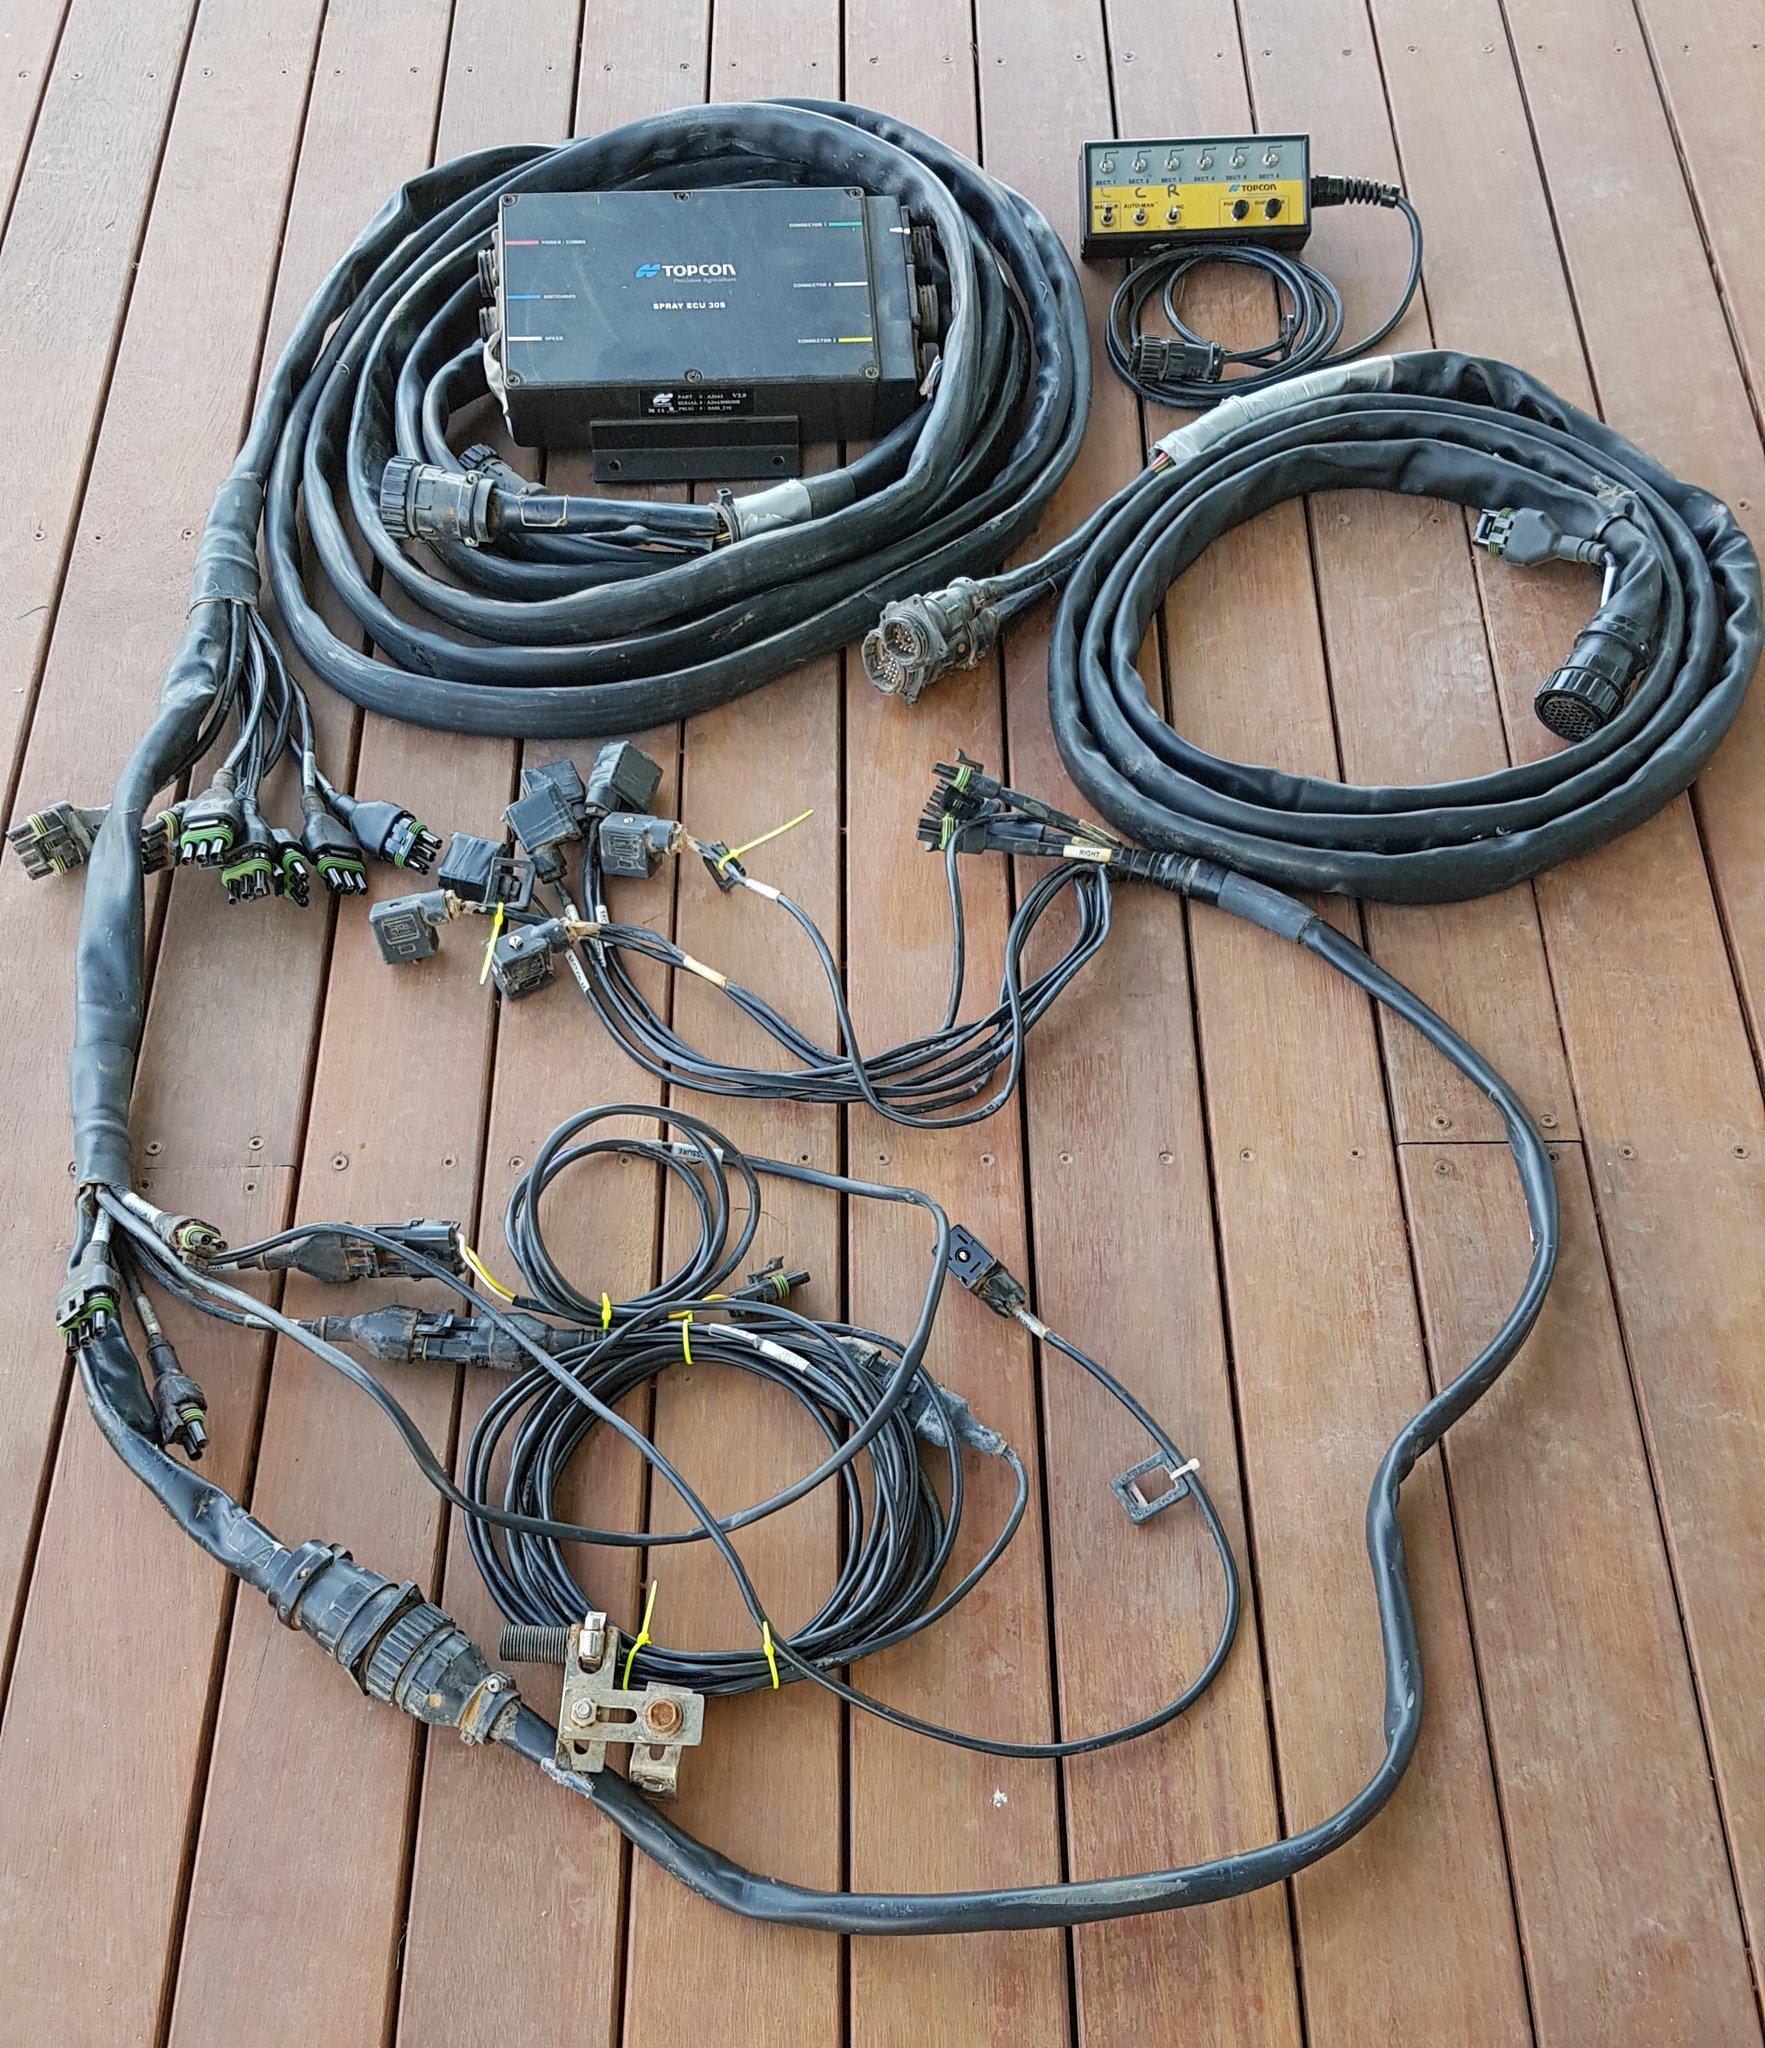 Topcon Wiring Diagram. . Wiring Diagram on